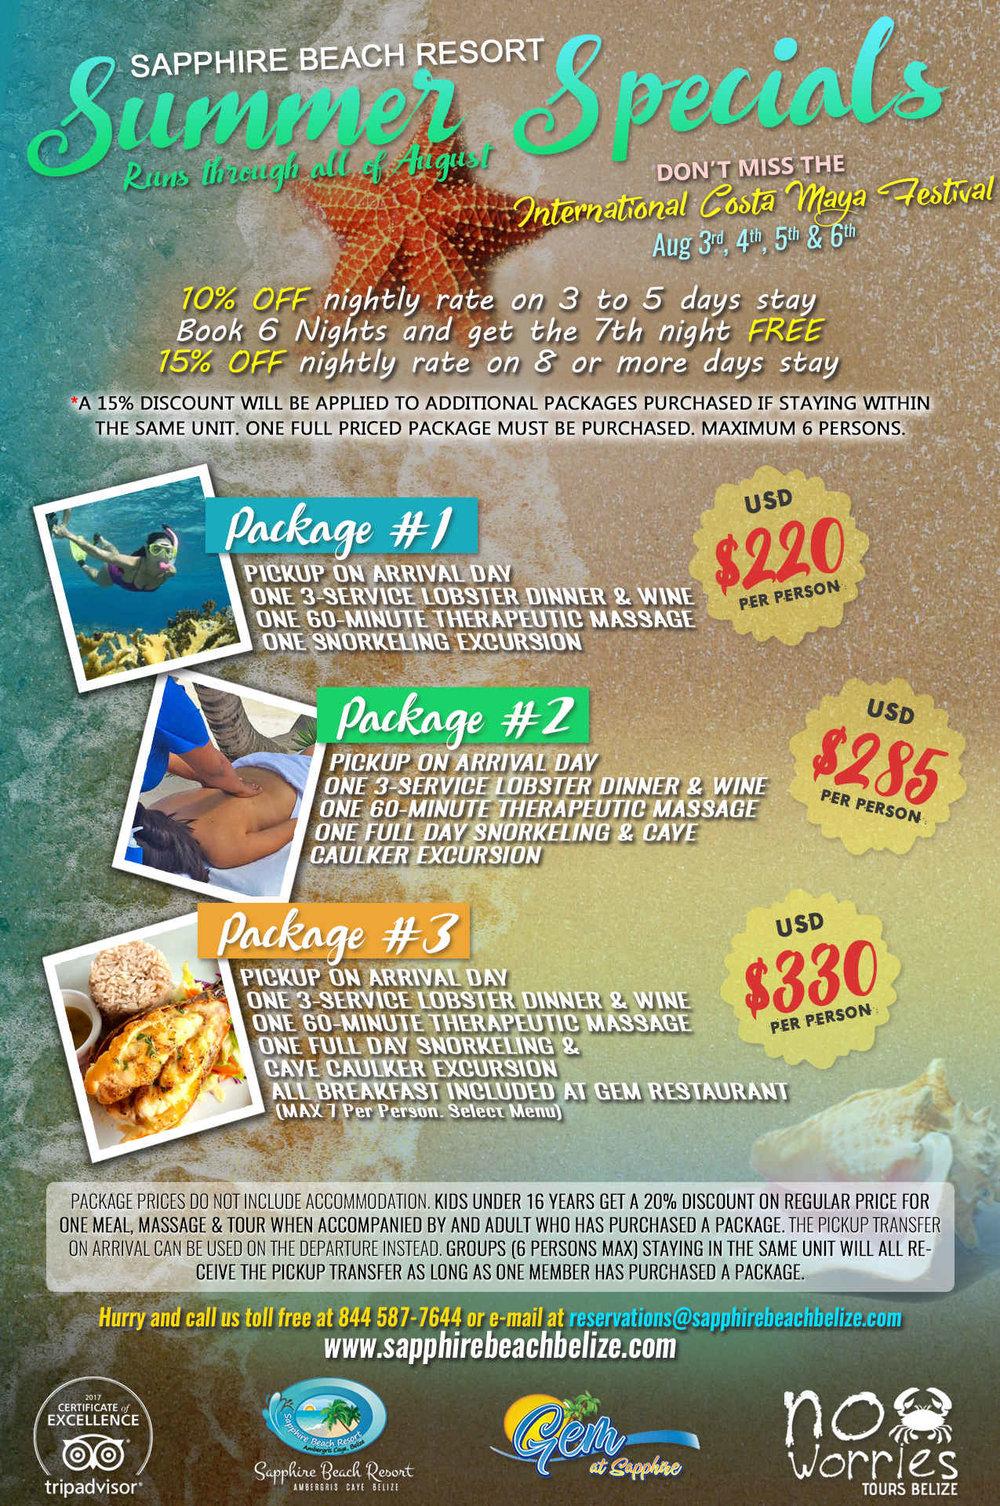 Costa Maya Sapphire Belize Vacation Specials.jpg